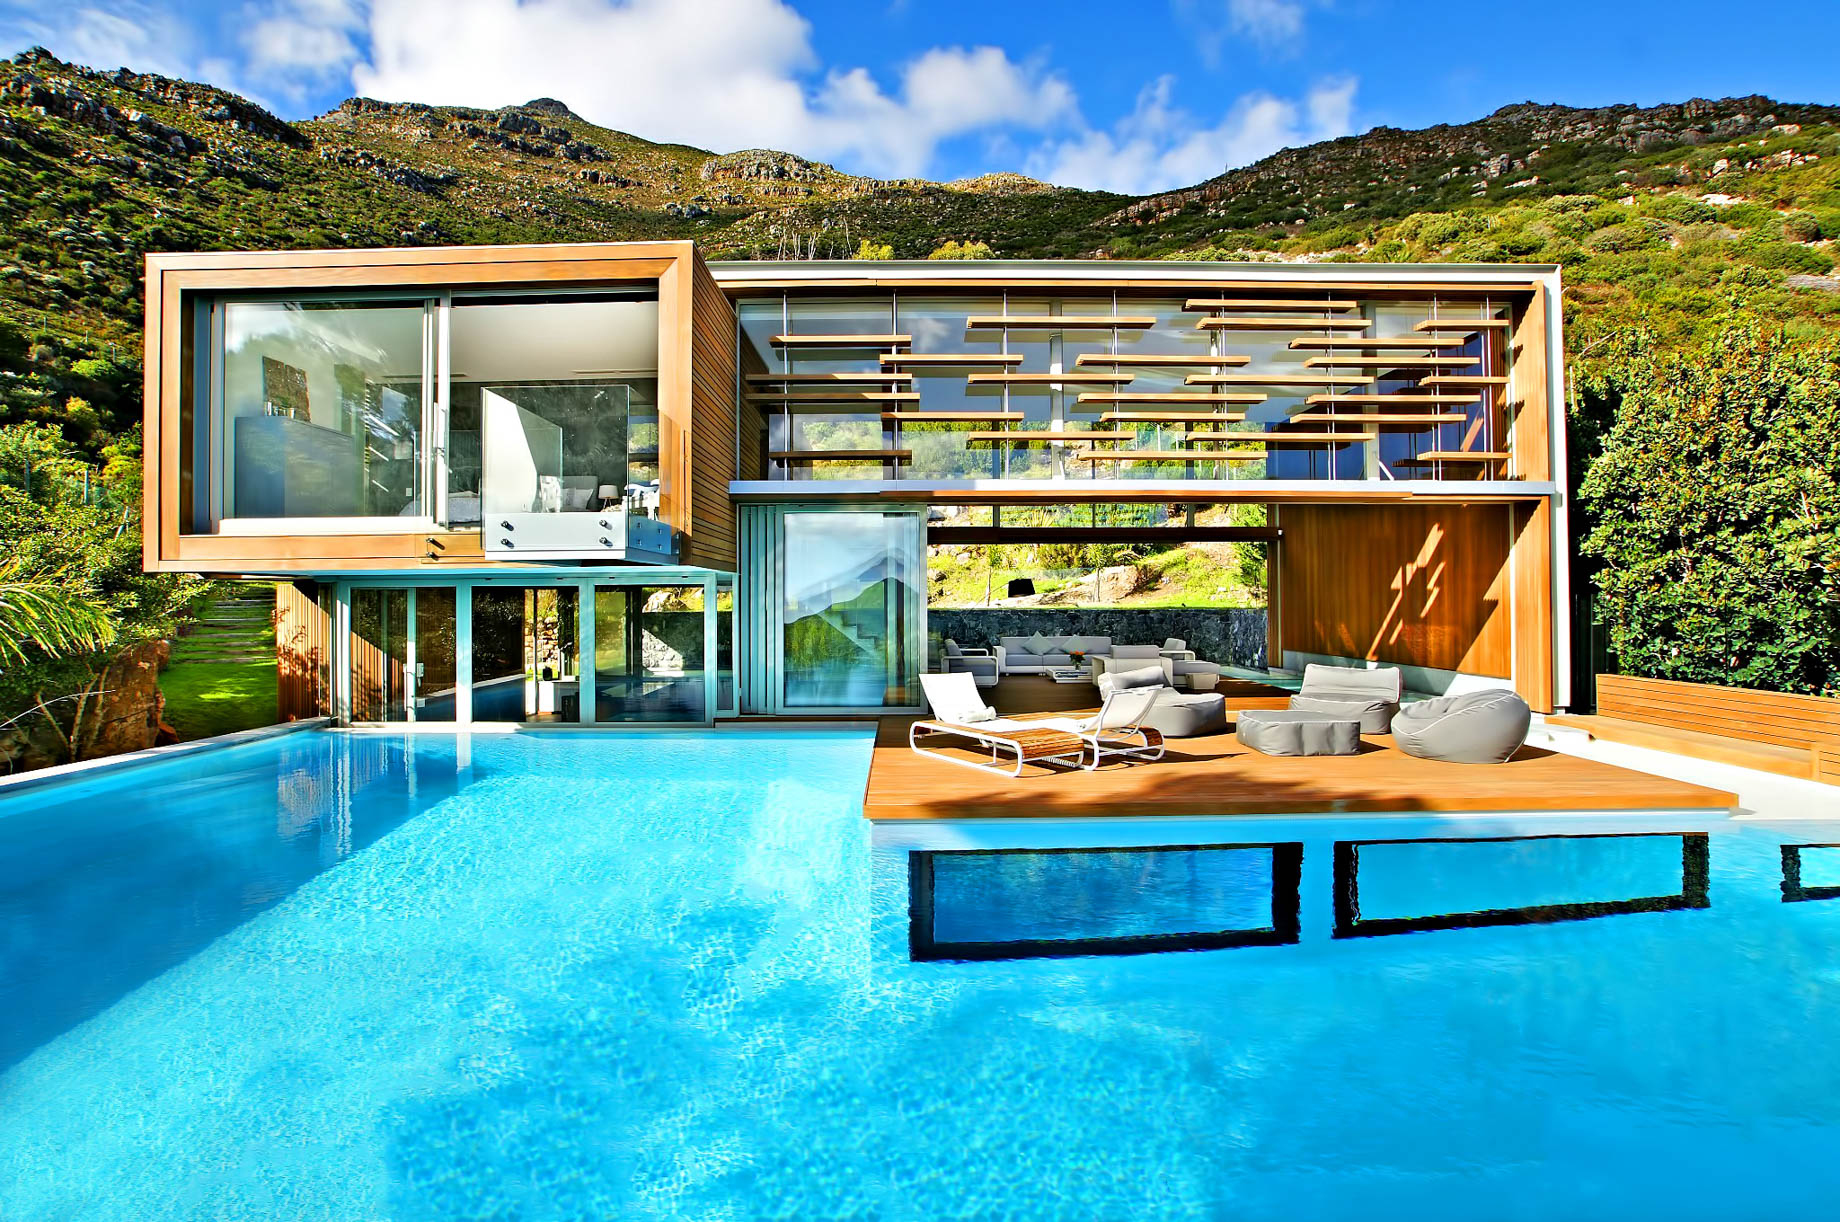 Spa House Luxury Villa Hout Bay Cape